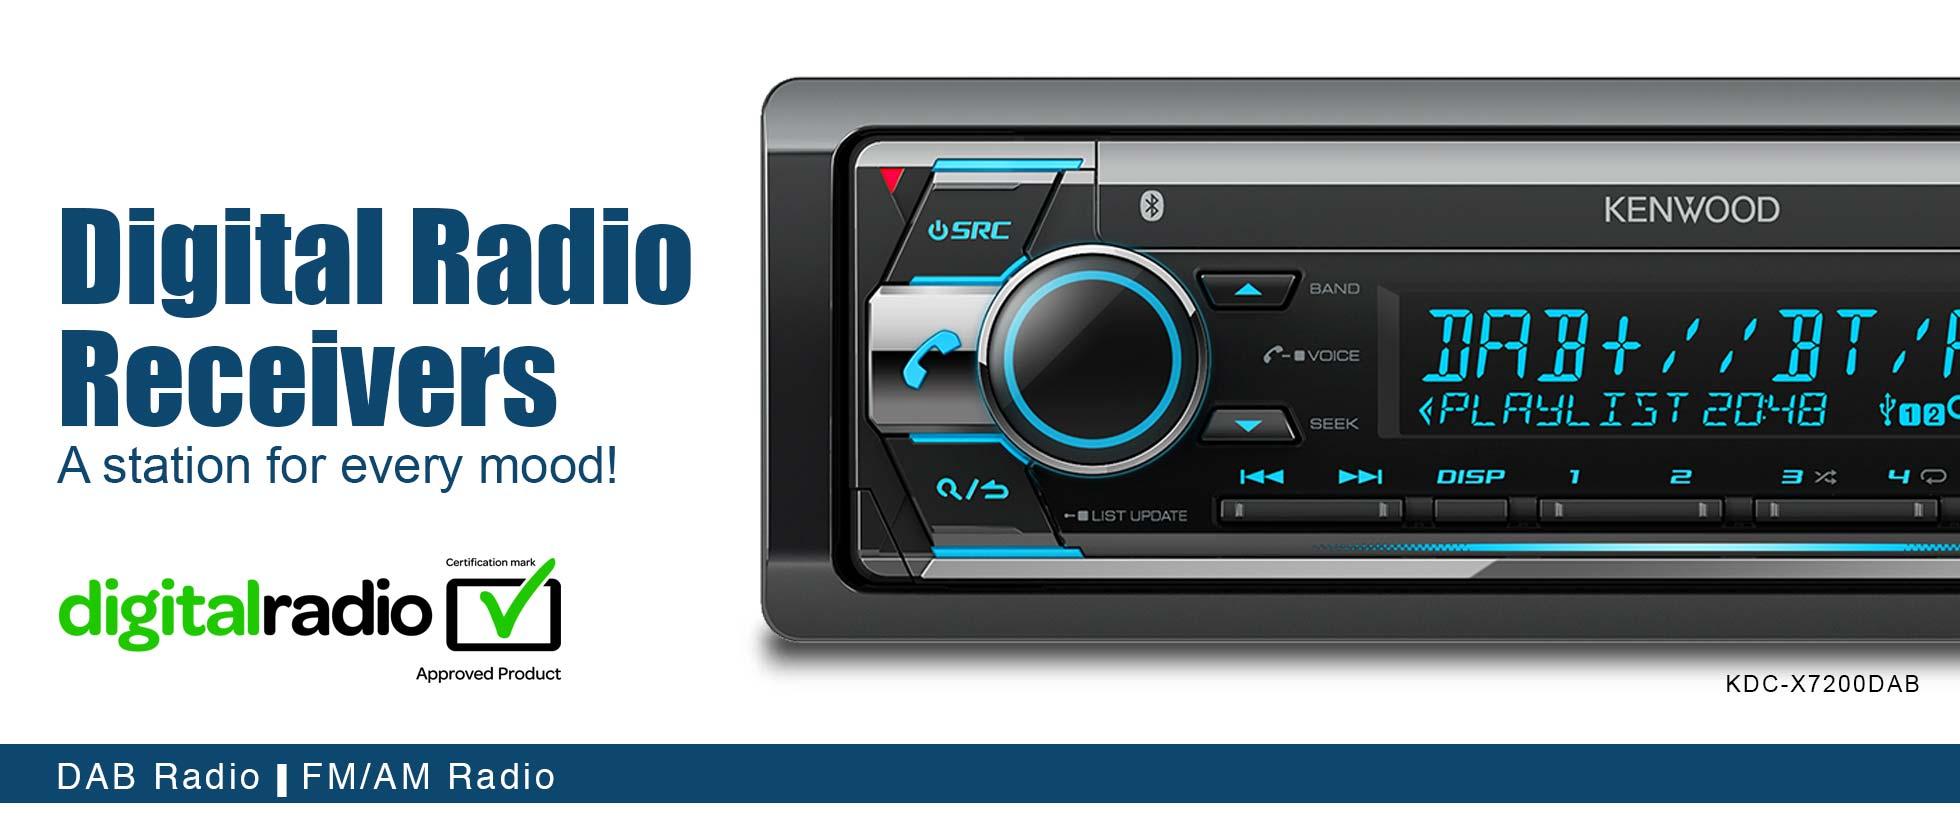 dab digital car radio dpx 7000dab features kenwood uk. Black Bedroom Furniture Sets. Home Design Ideas